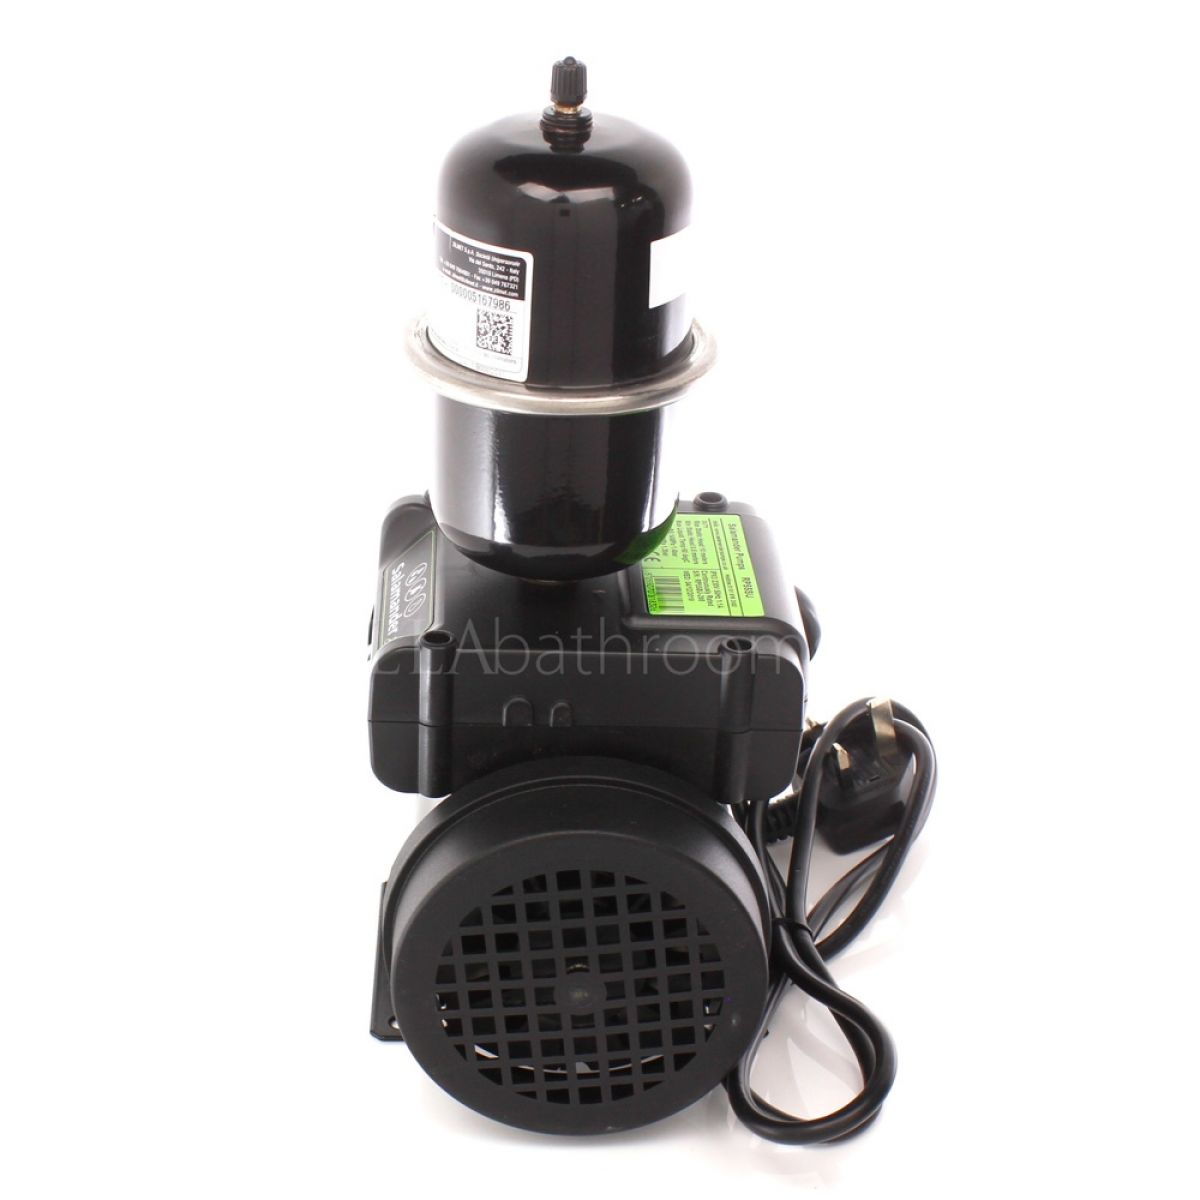 Salamander RP55SU 1.6 Bar Single Universal Shower Pump Right Side